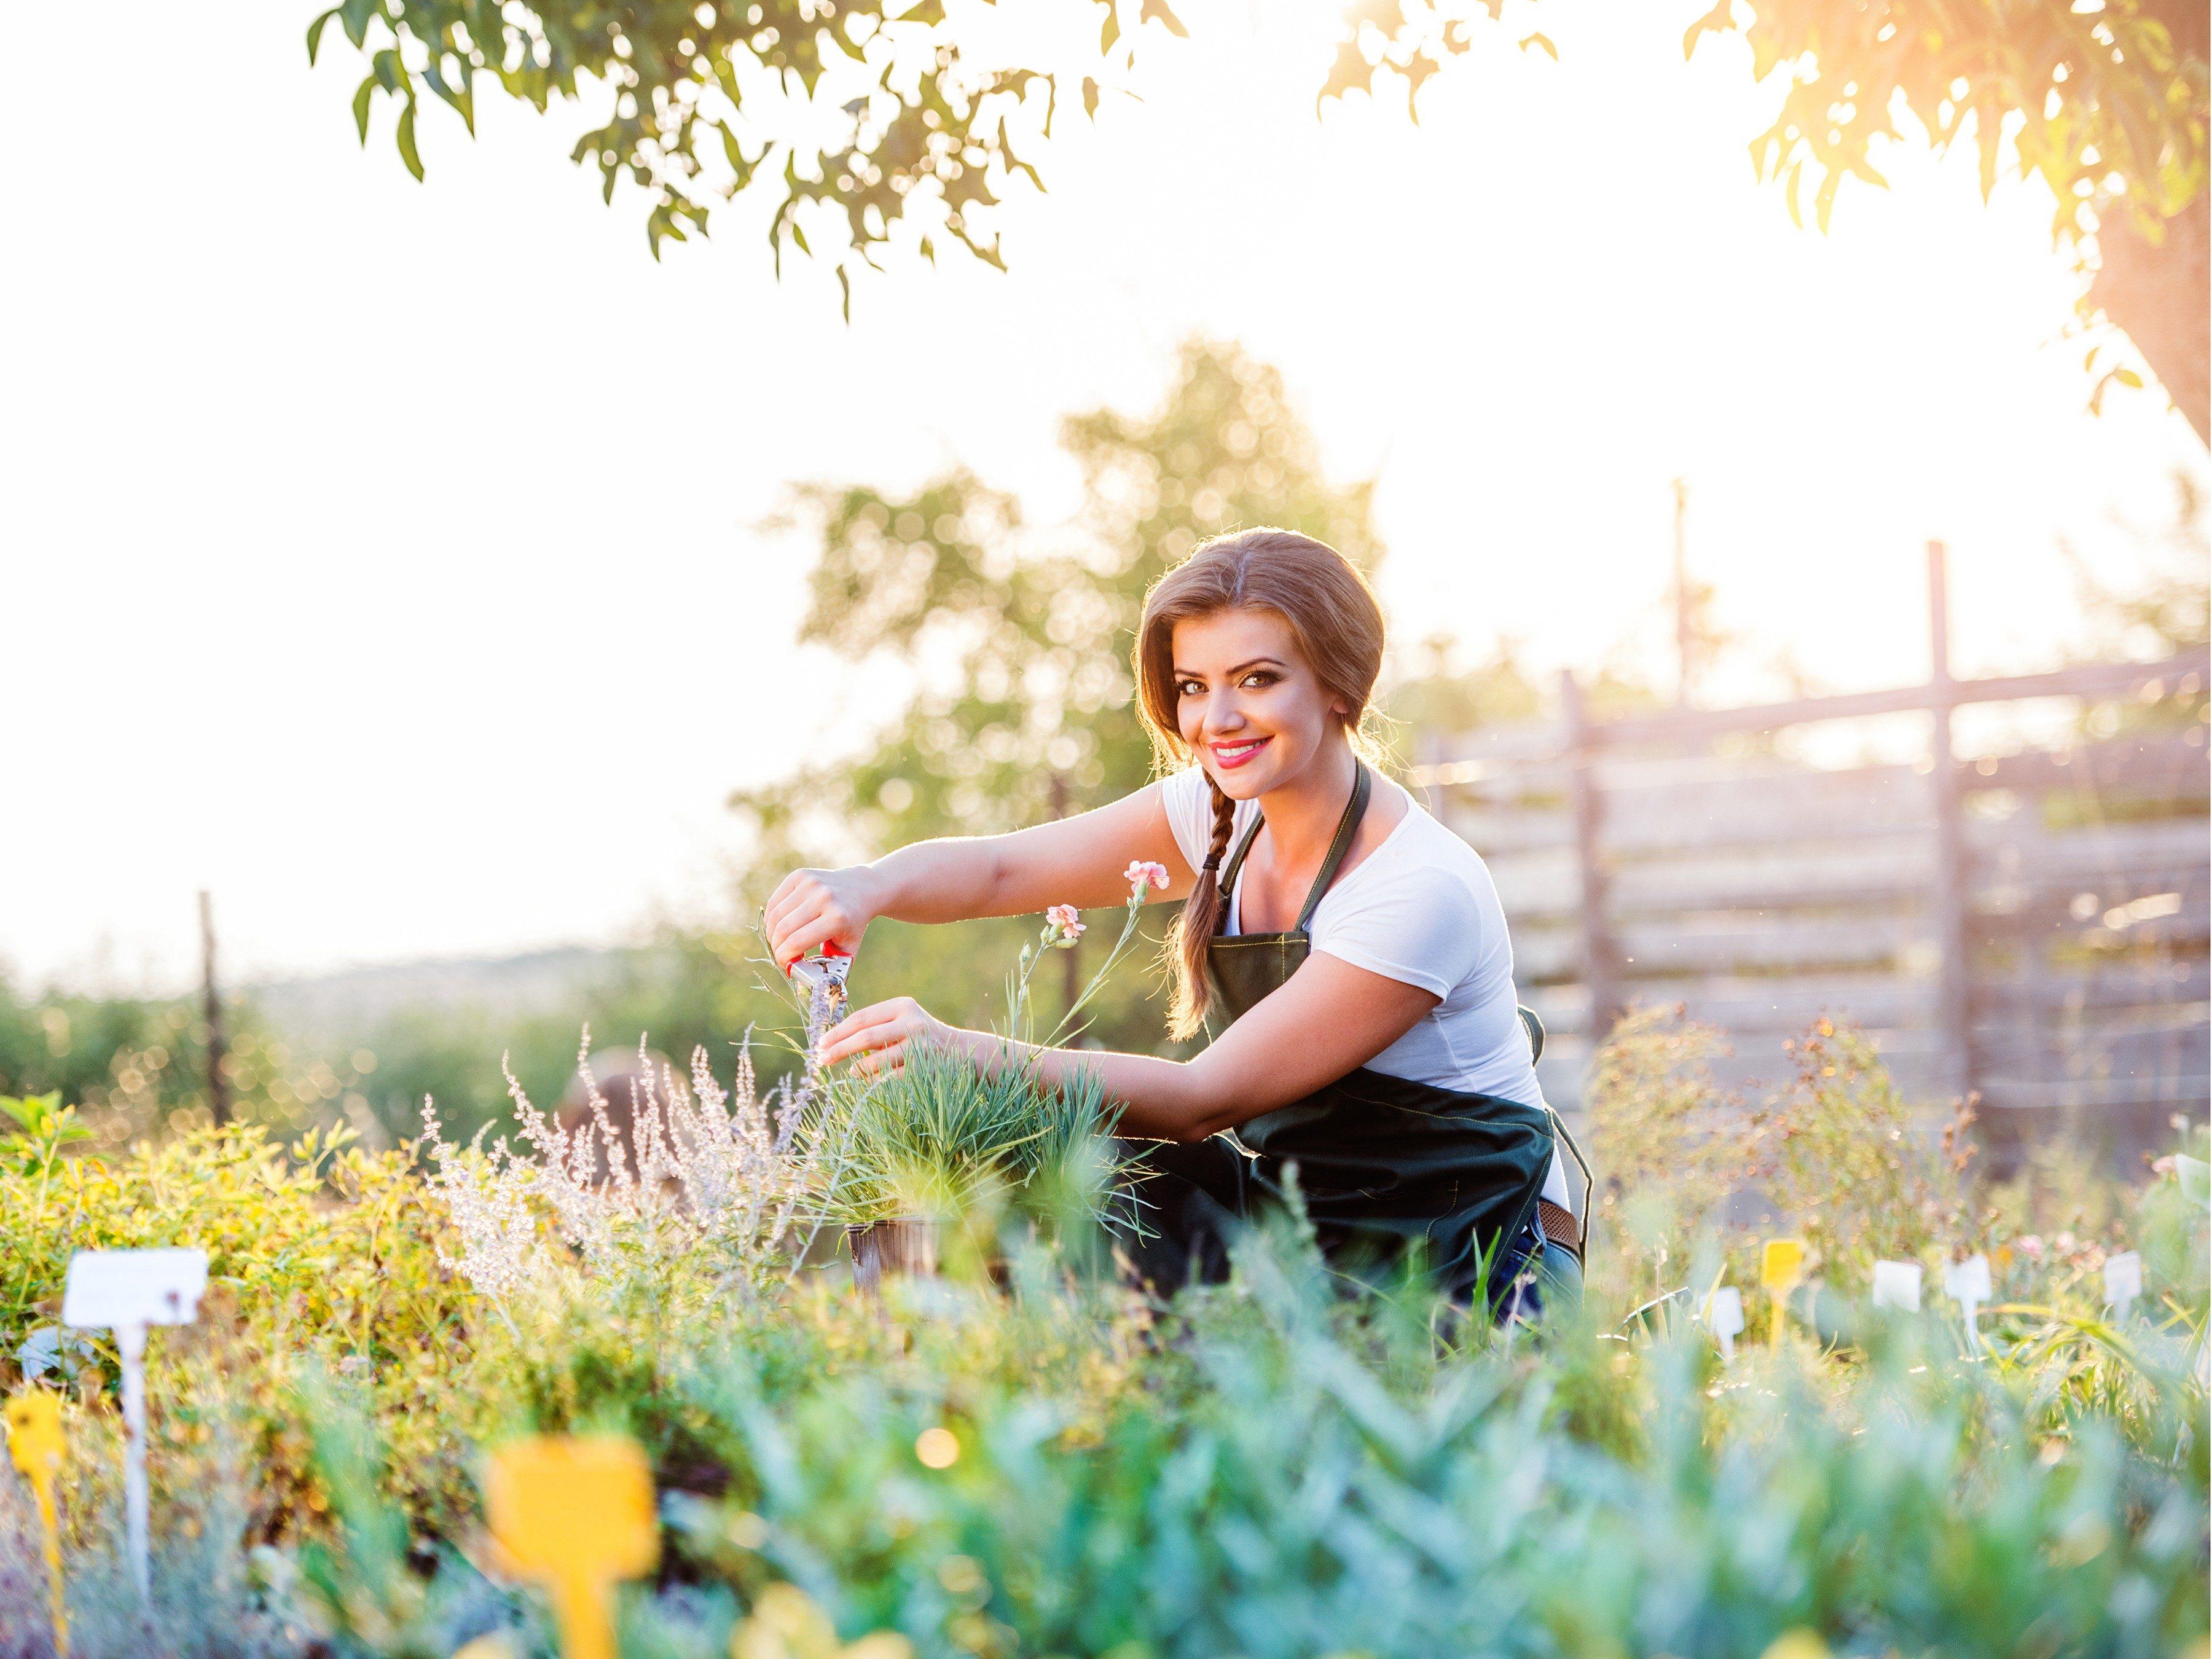 Grow Your Own Healing Garden